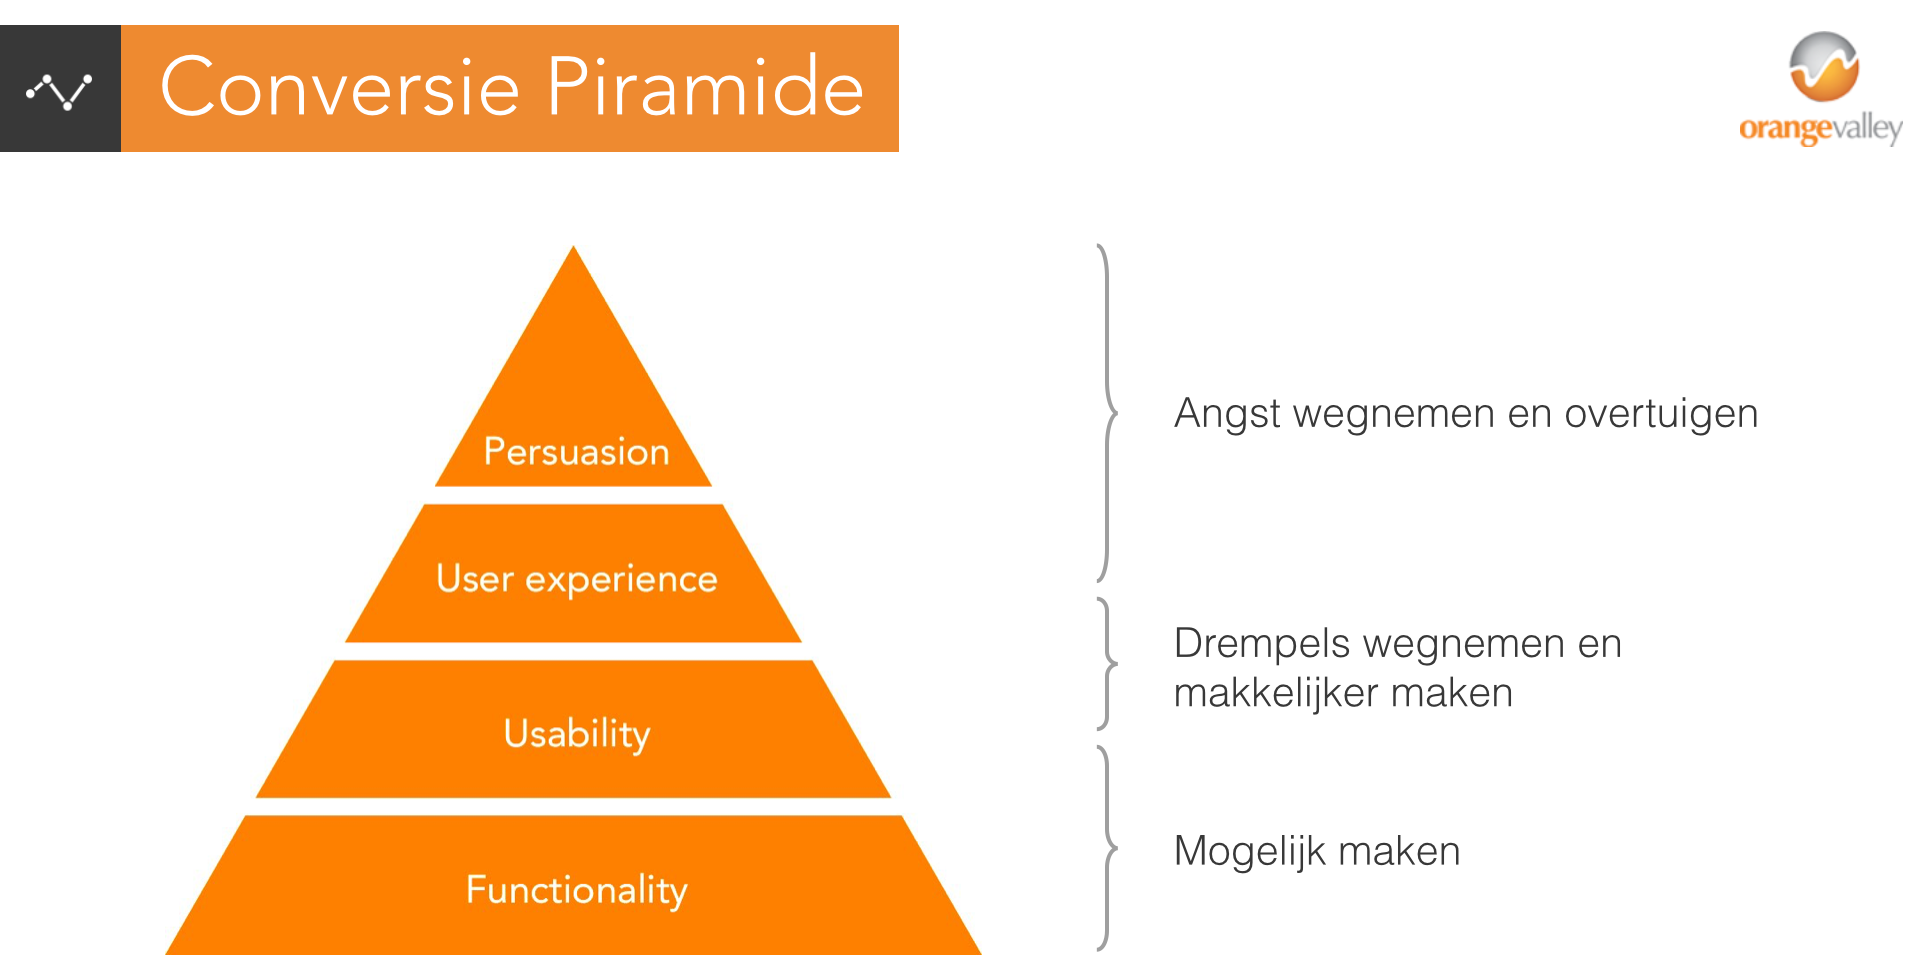 Conversie Piramide